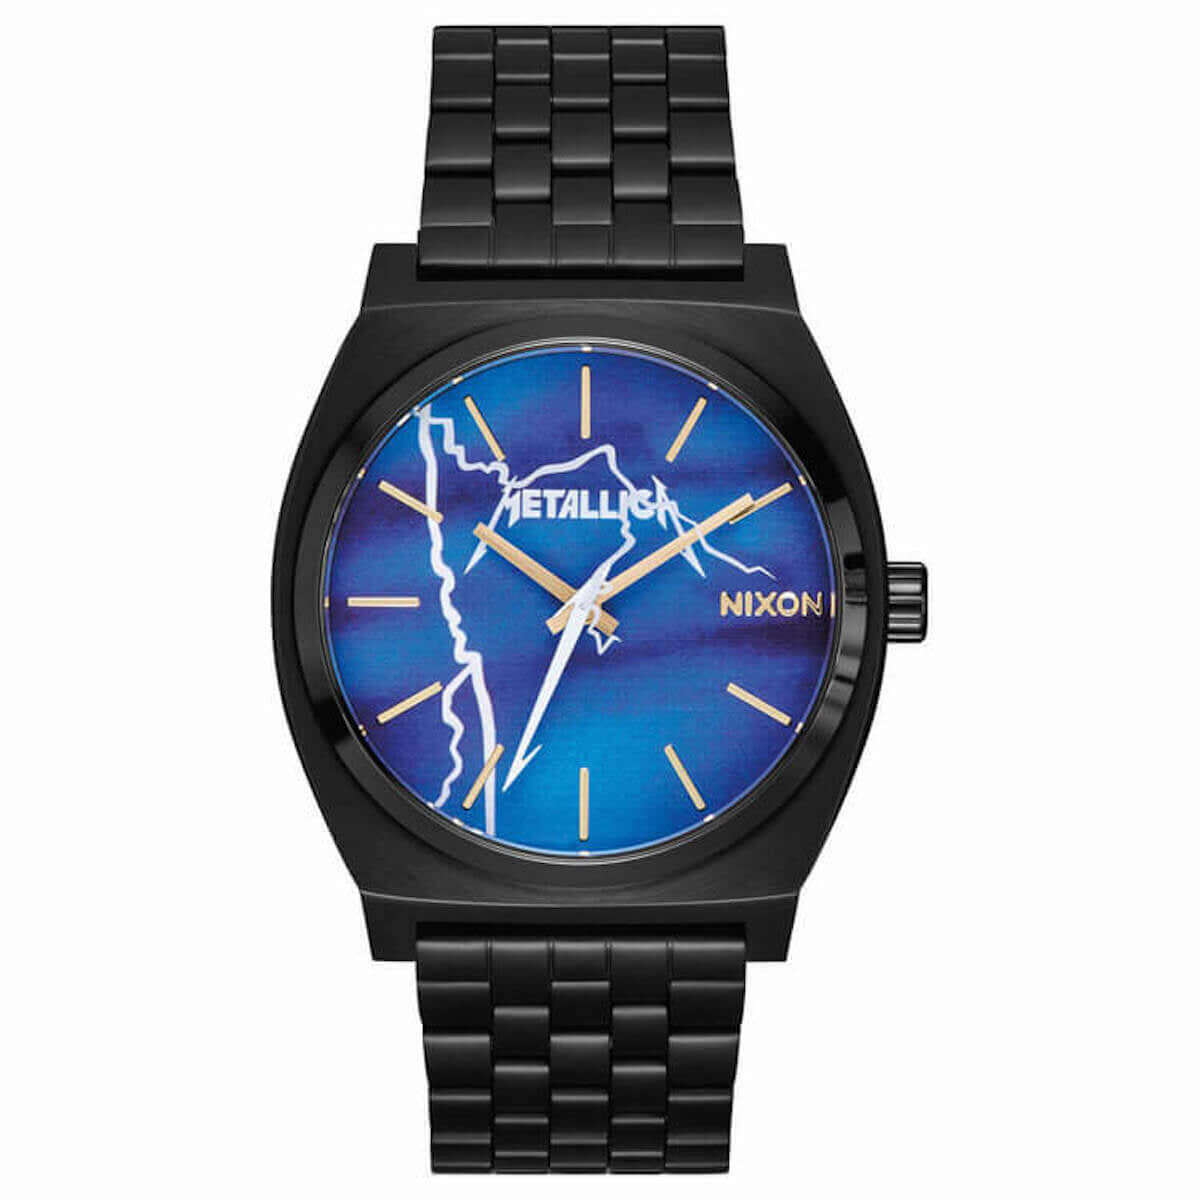 METALLICA X NIXON メタリカの名盤が腕時計に! music181112_nixon-metallica_4-1200x1200